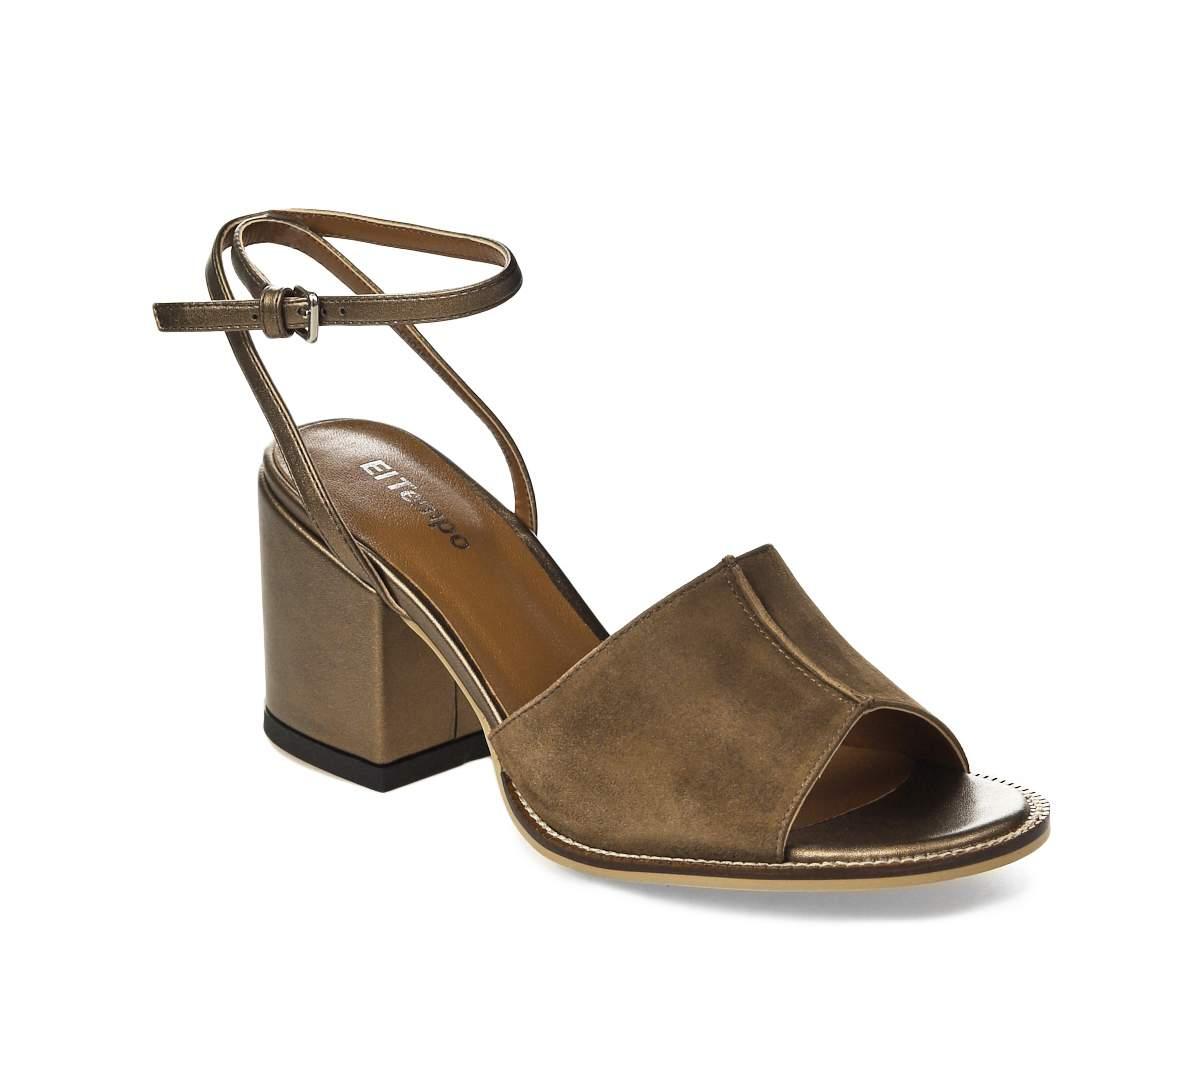 Босоножки женские El Tempo SWB15_G1045-A9503 коричневые 35 EU